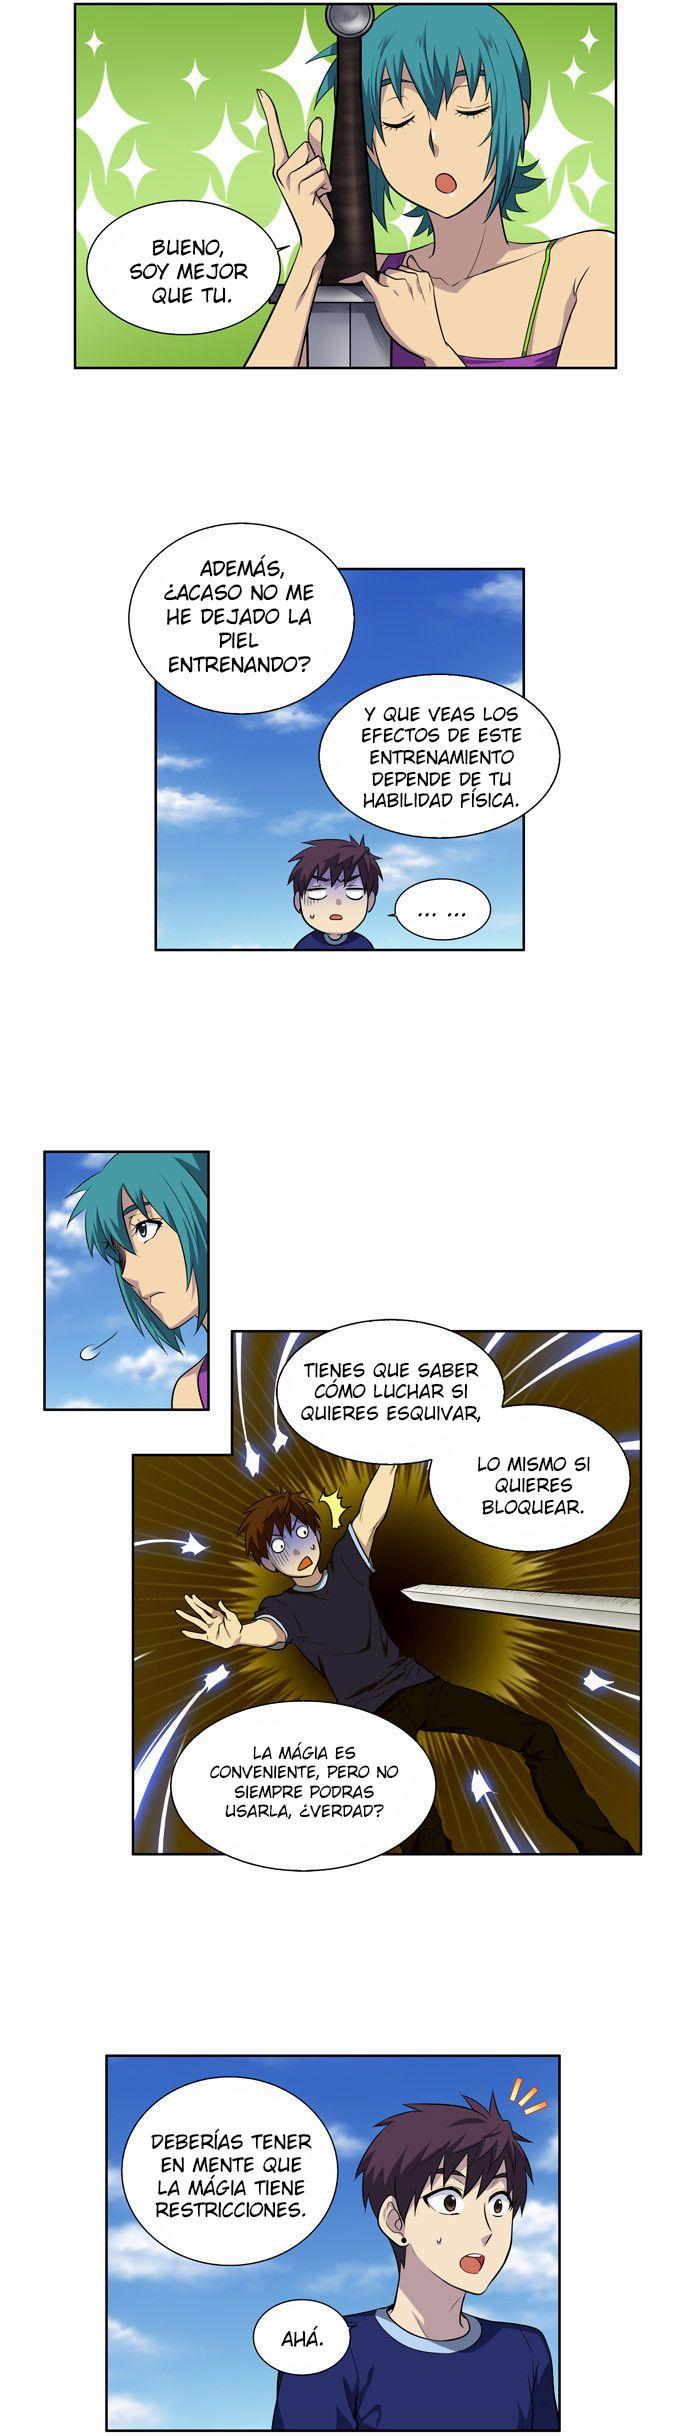 https://c5.ninemanga.com/es_manga/61/1725/464211/56163596ec98f97af53648f7b3f711ef.jpg Page 6